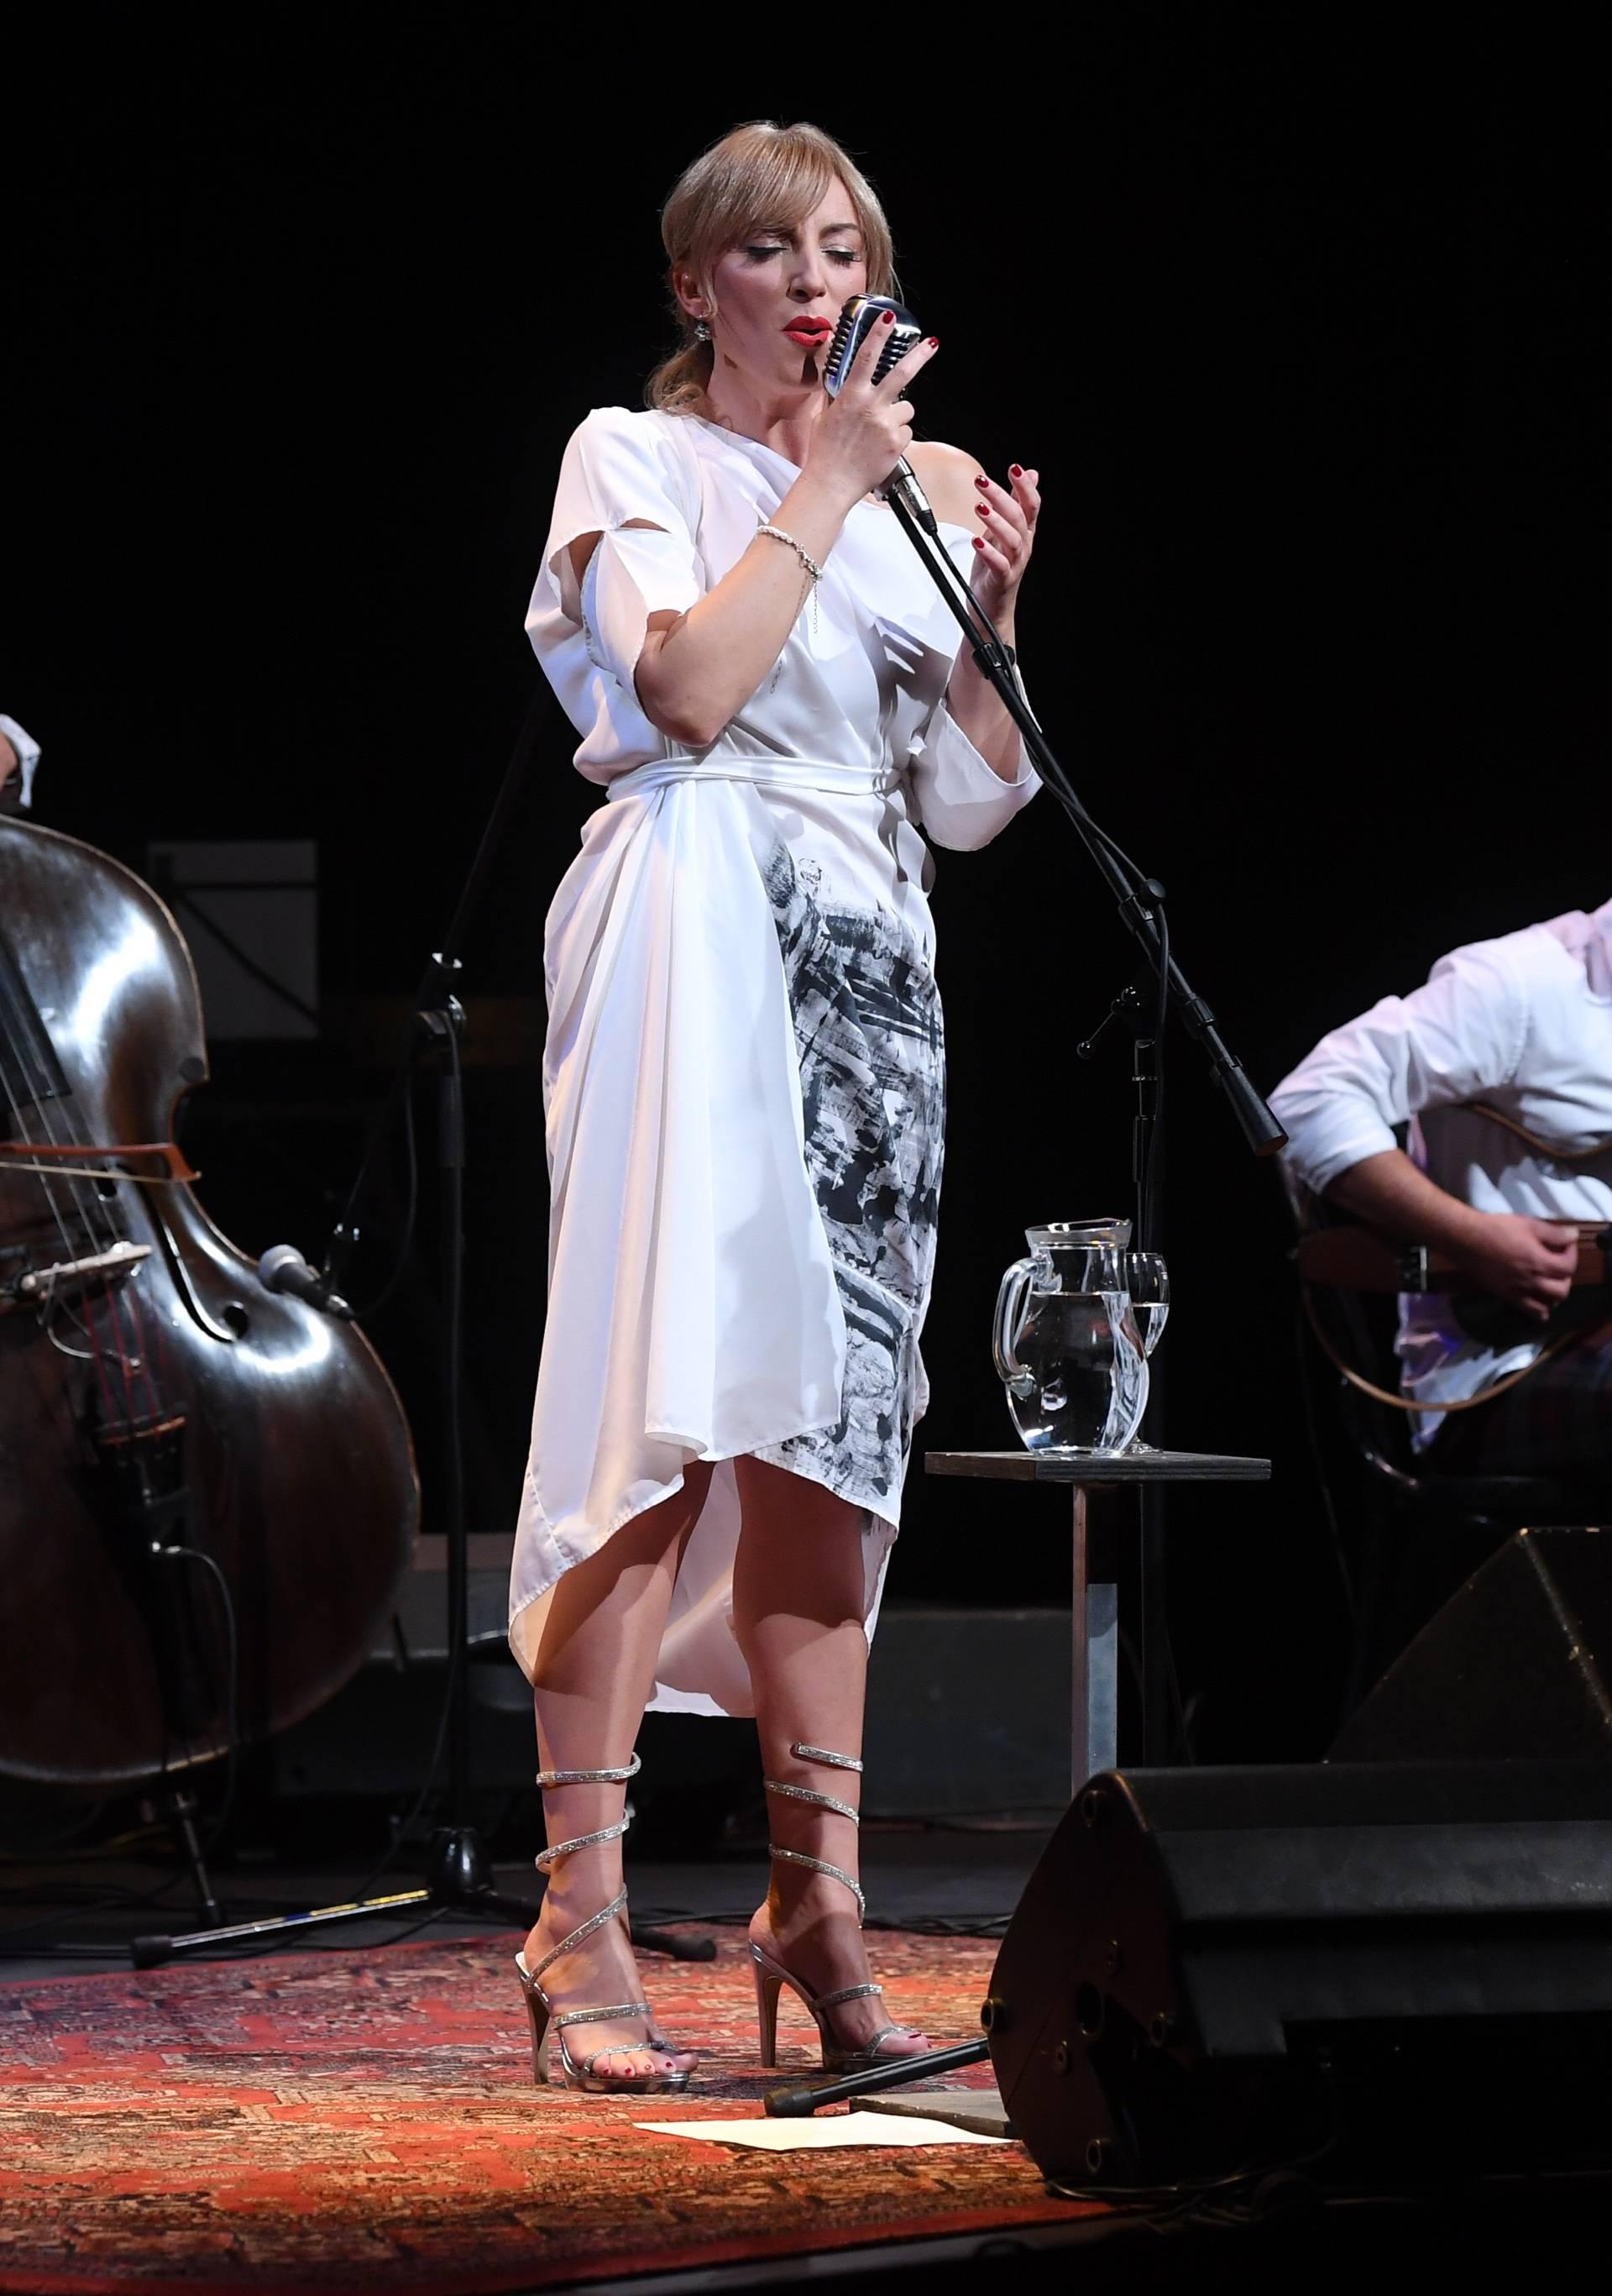 Zagreb: Koncert Filmmusicorkestra u Kerempuhu